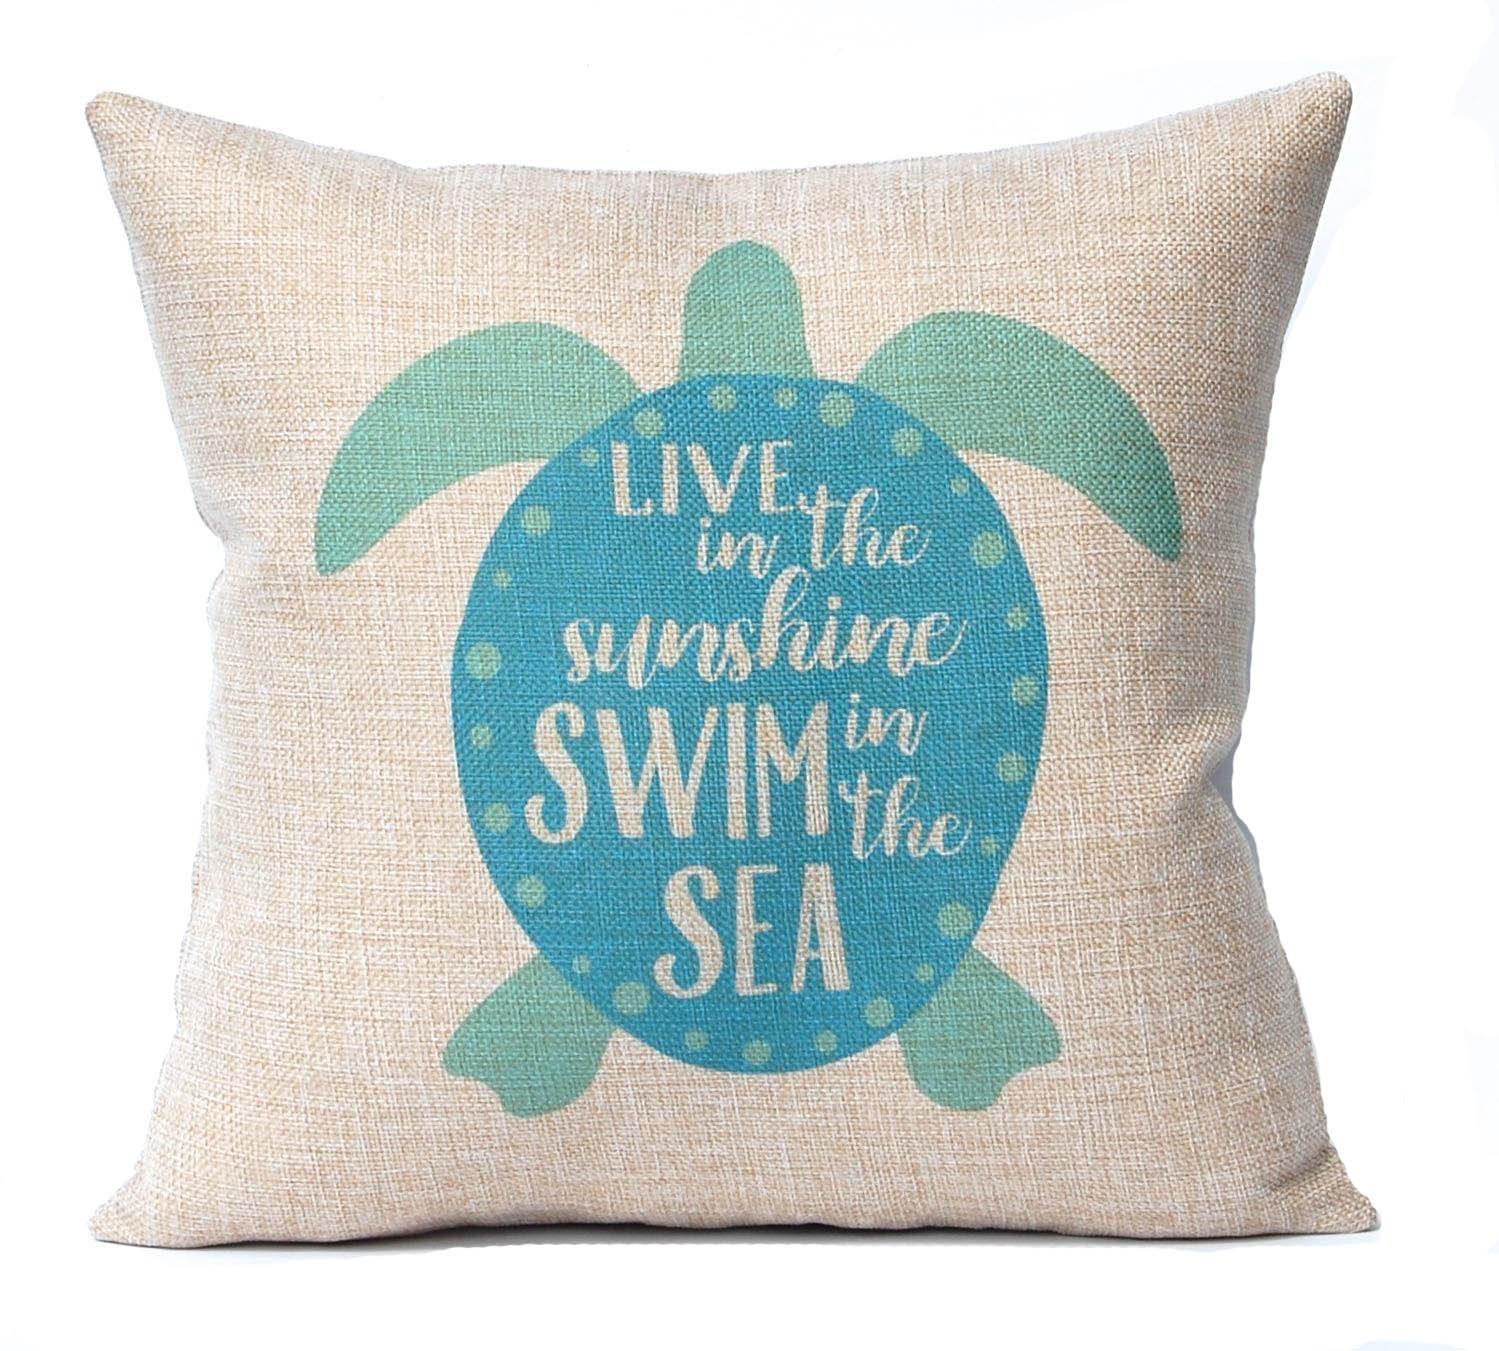 Beach Home Decor Pillows: Sea Turtle Pillow Cover Beach Decor Turquoise Faux